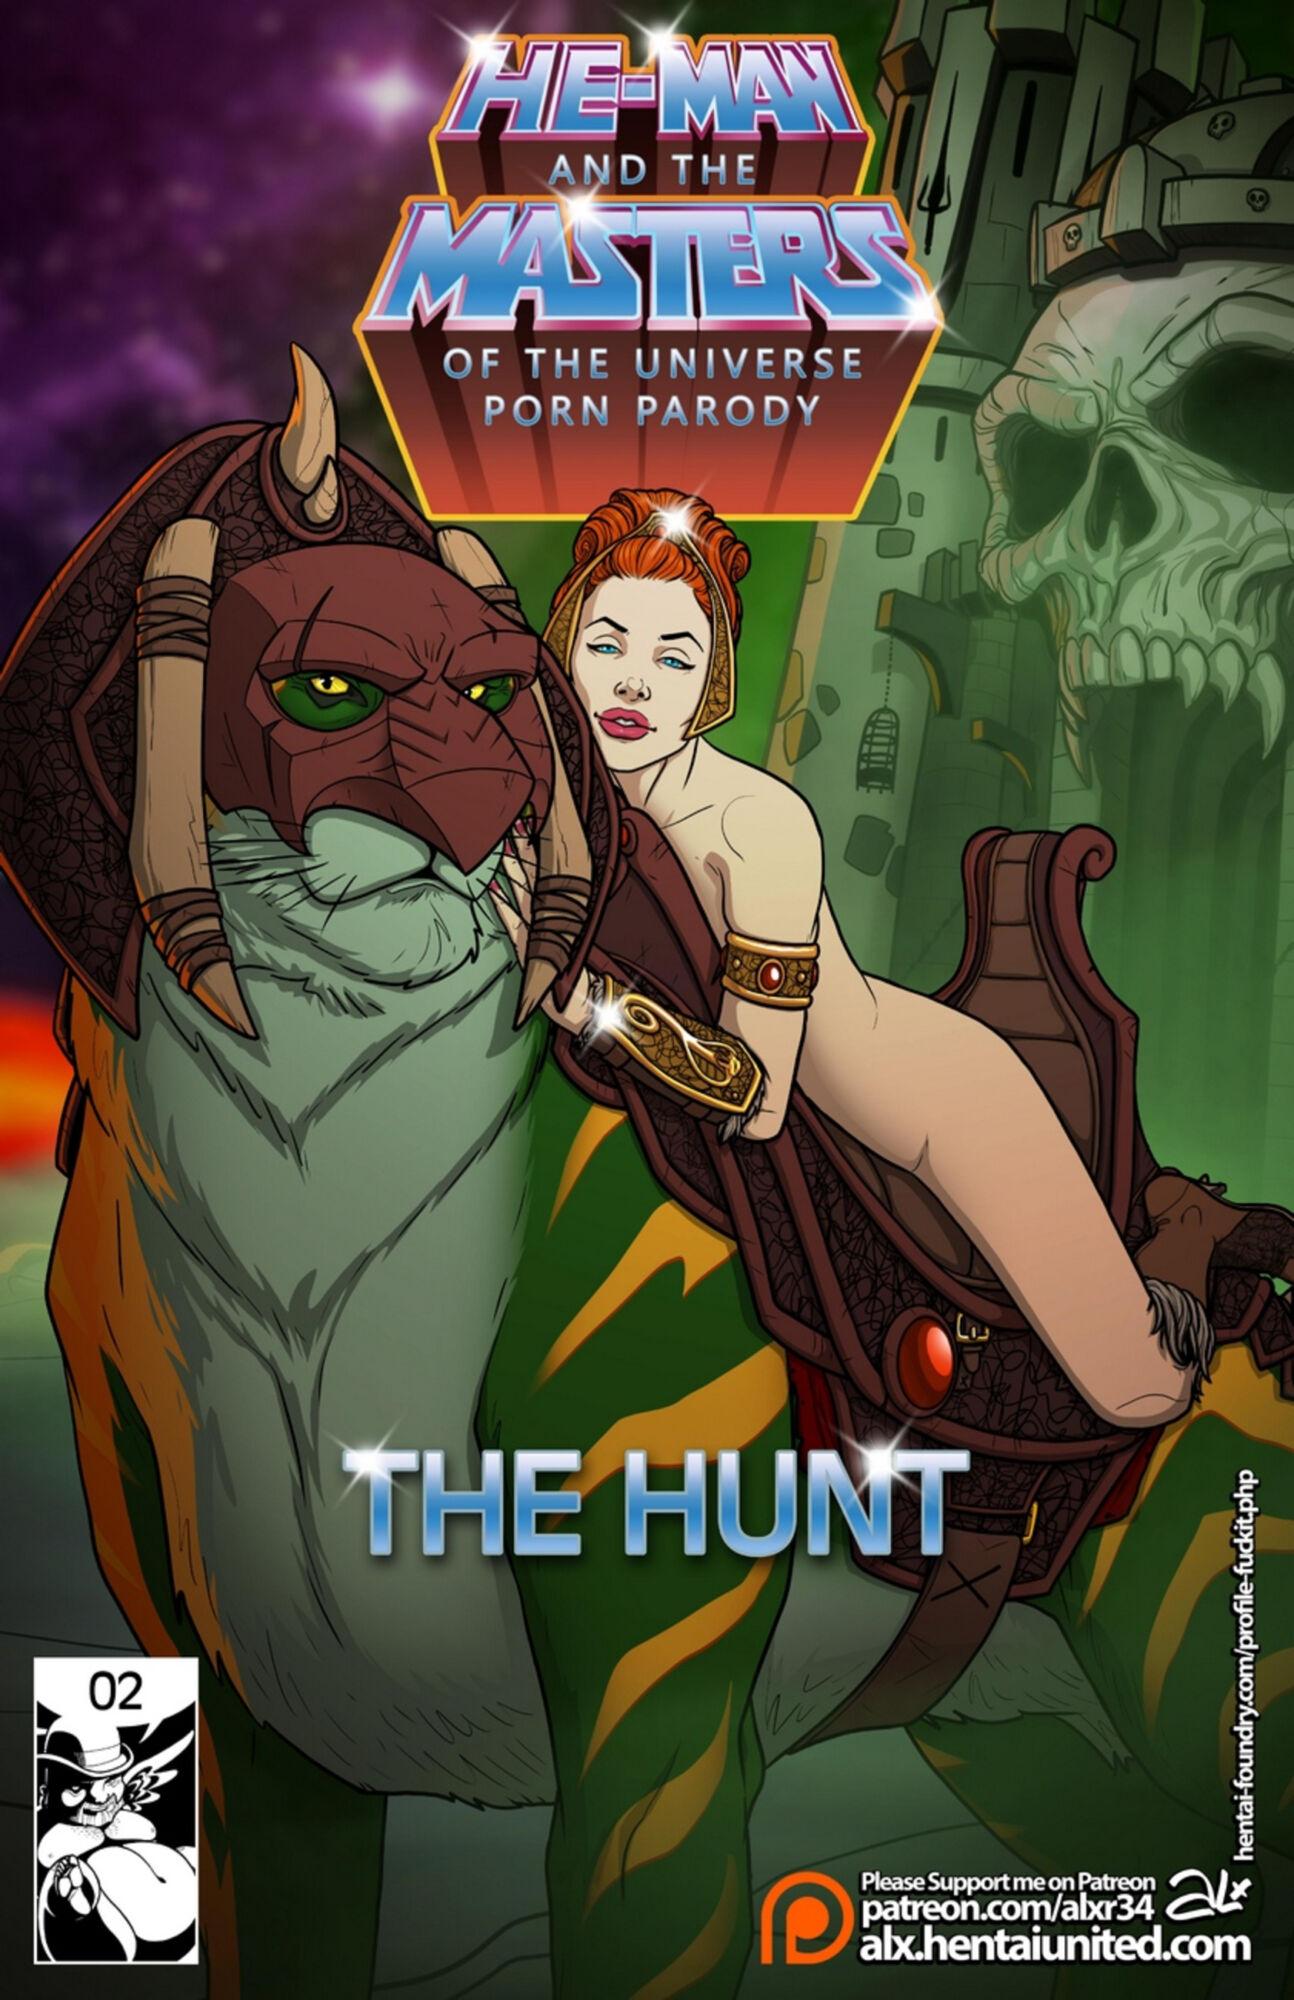 SureFap xxx porno He-Man And The Masters Of The Universe - [Fuckit (Alx)] - The Hunt